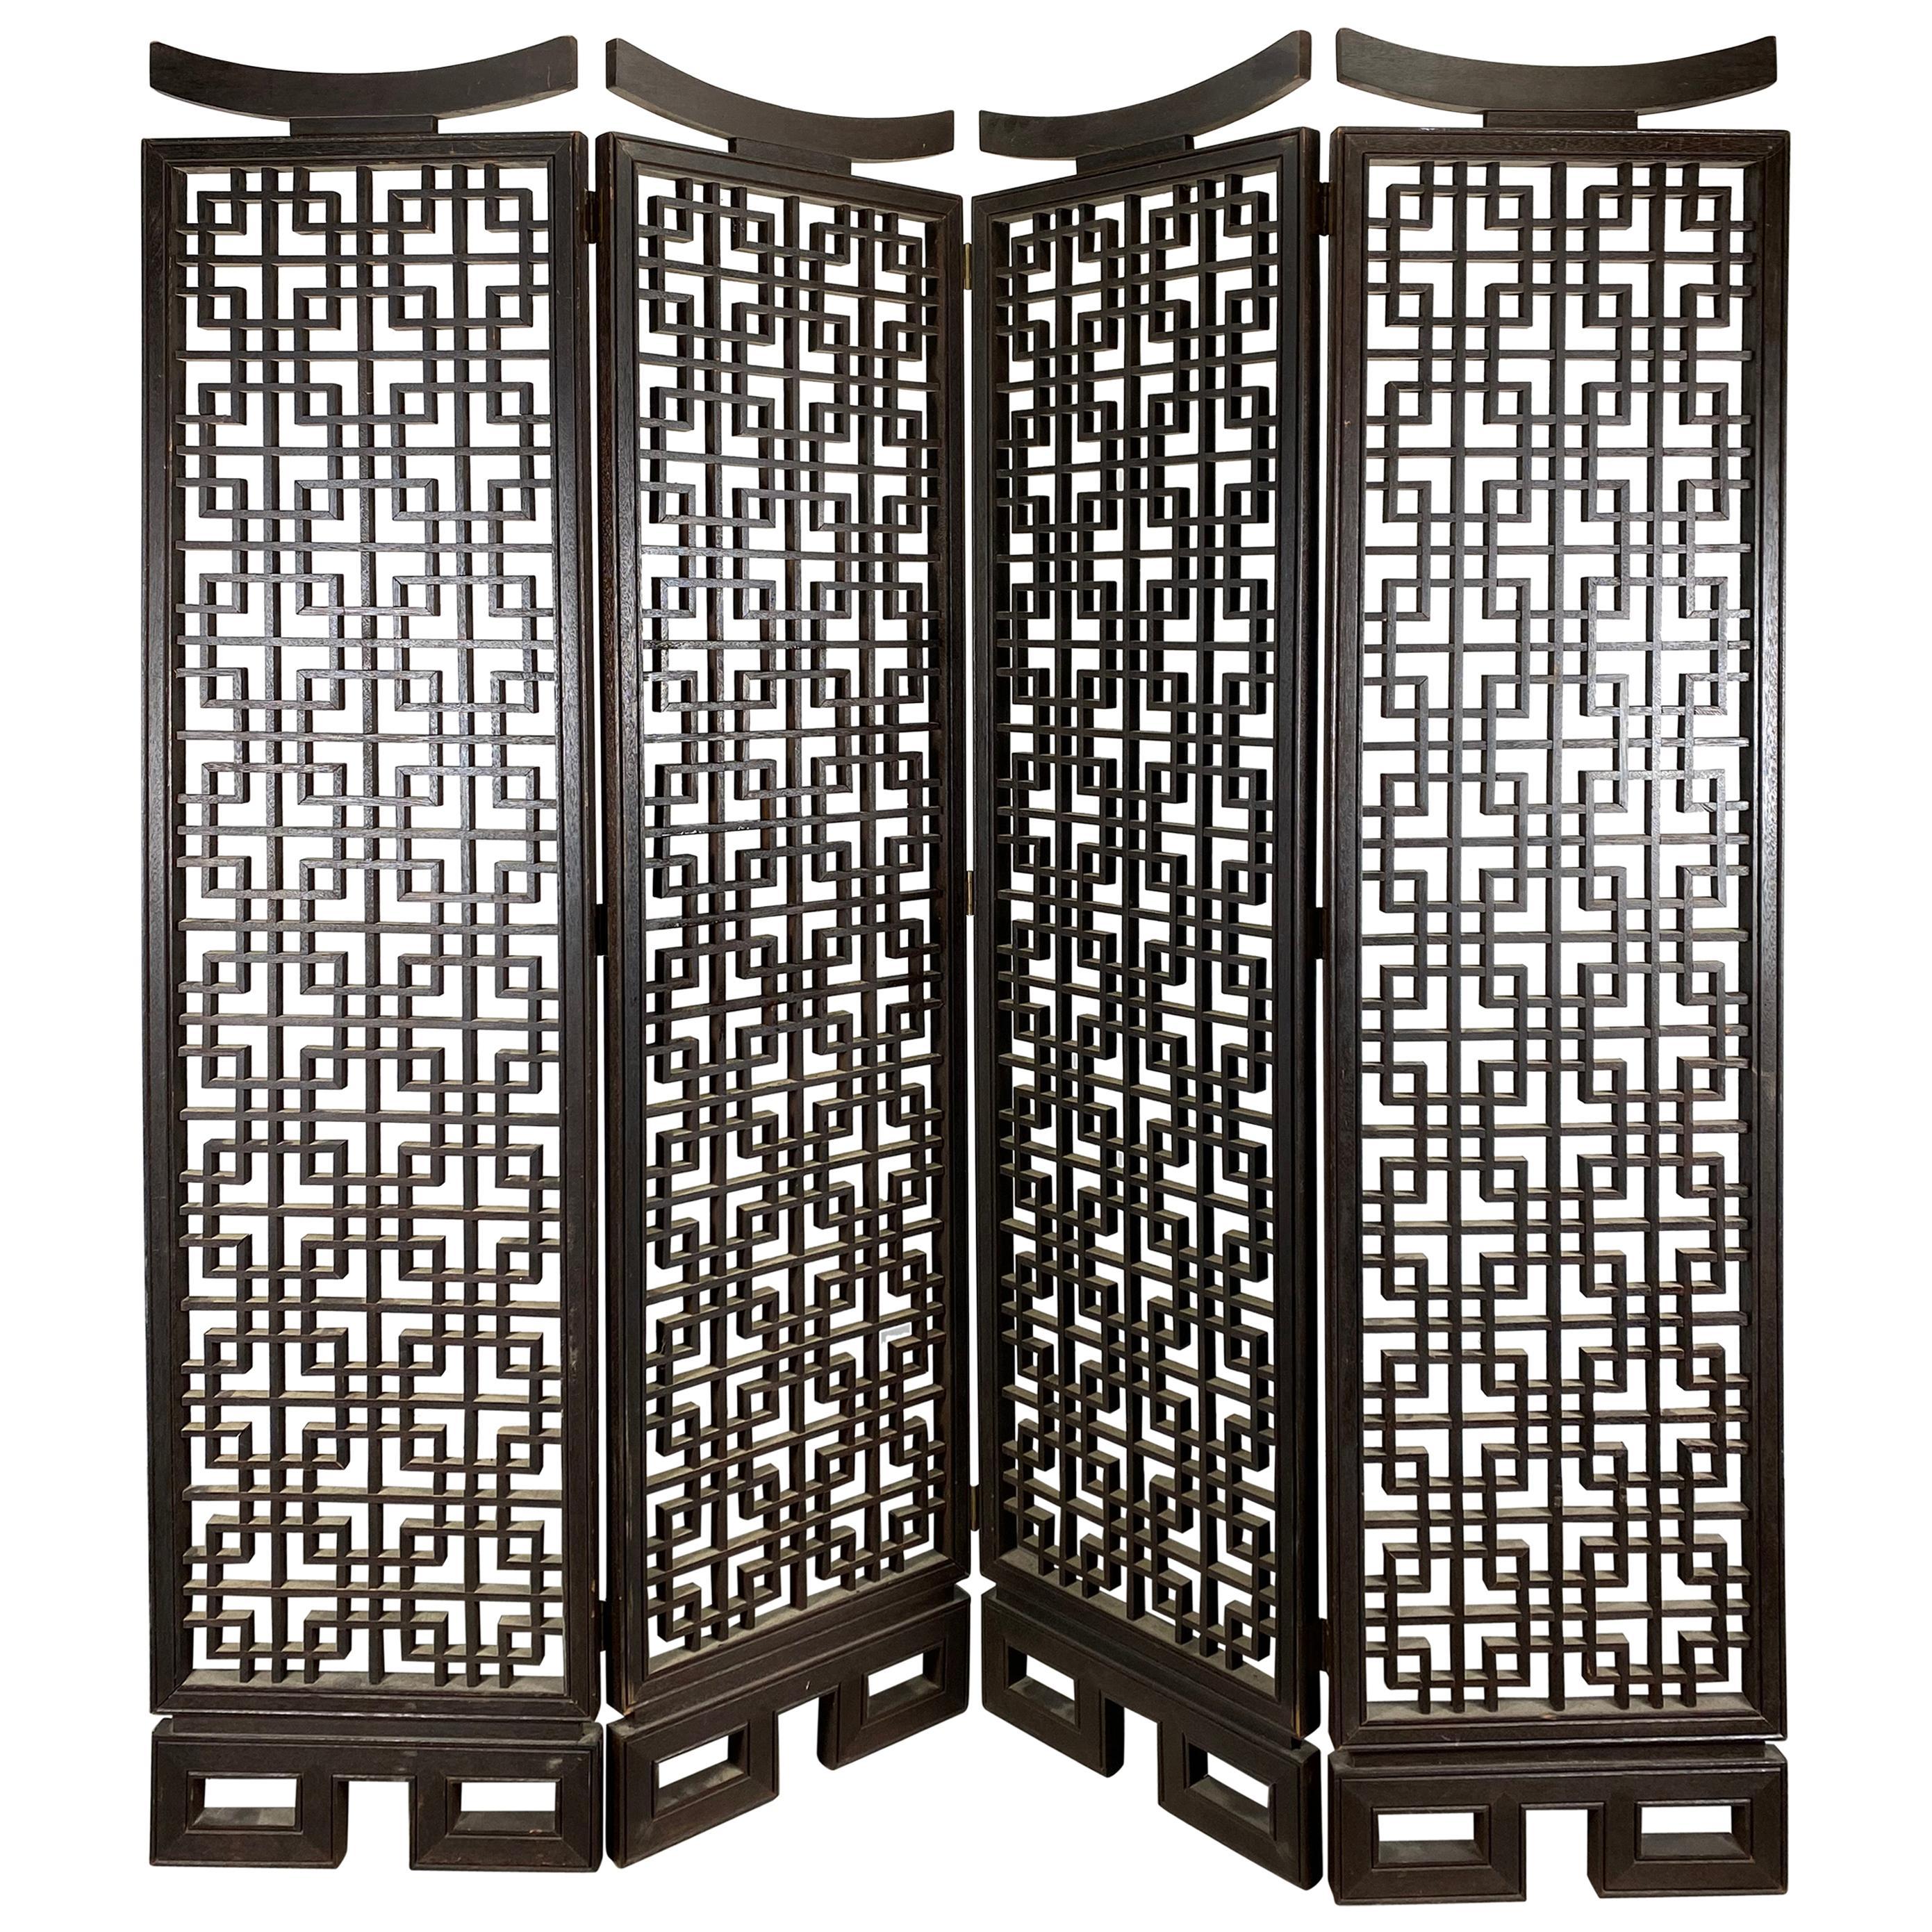 Unusual 4-Panel Traditional Meji Japanese Shoji Screen / Room Divider